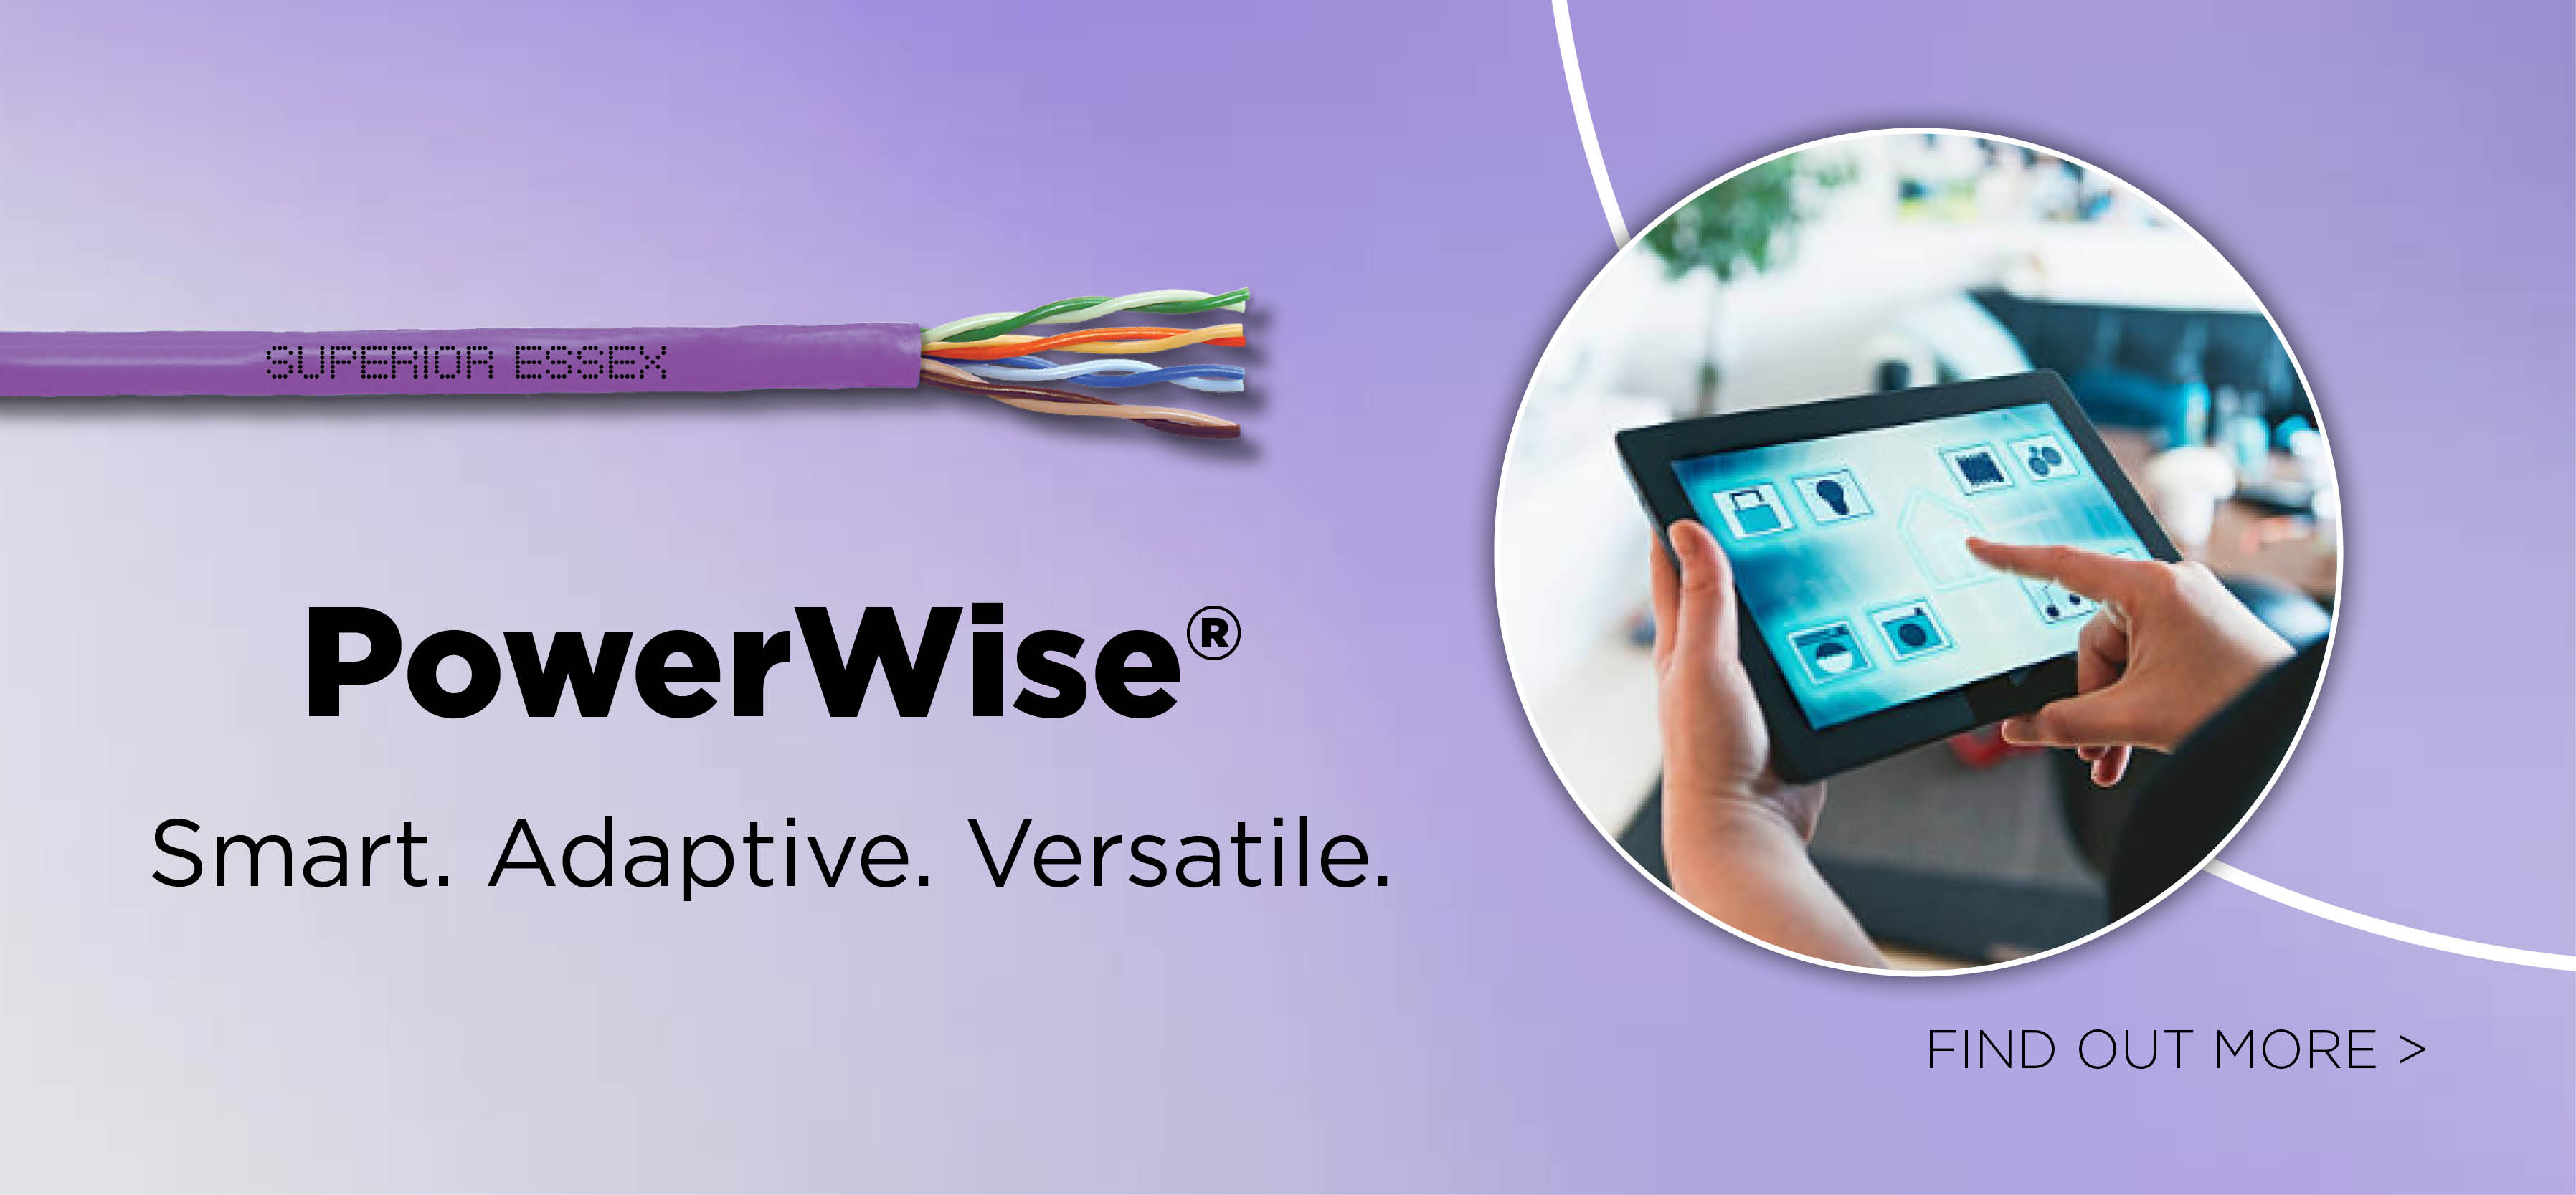 PowerWise_24